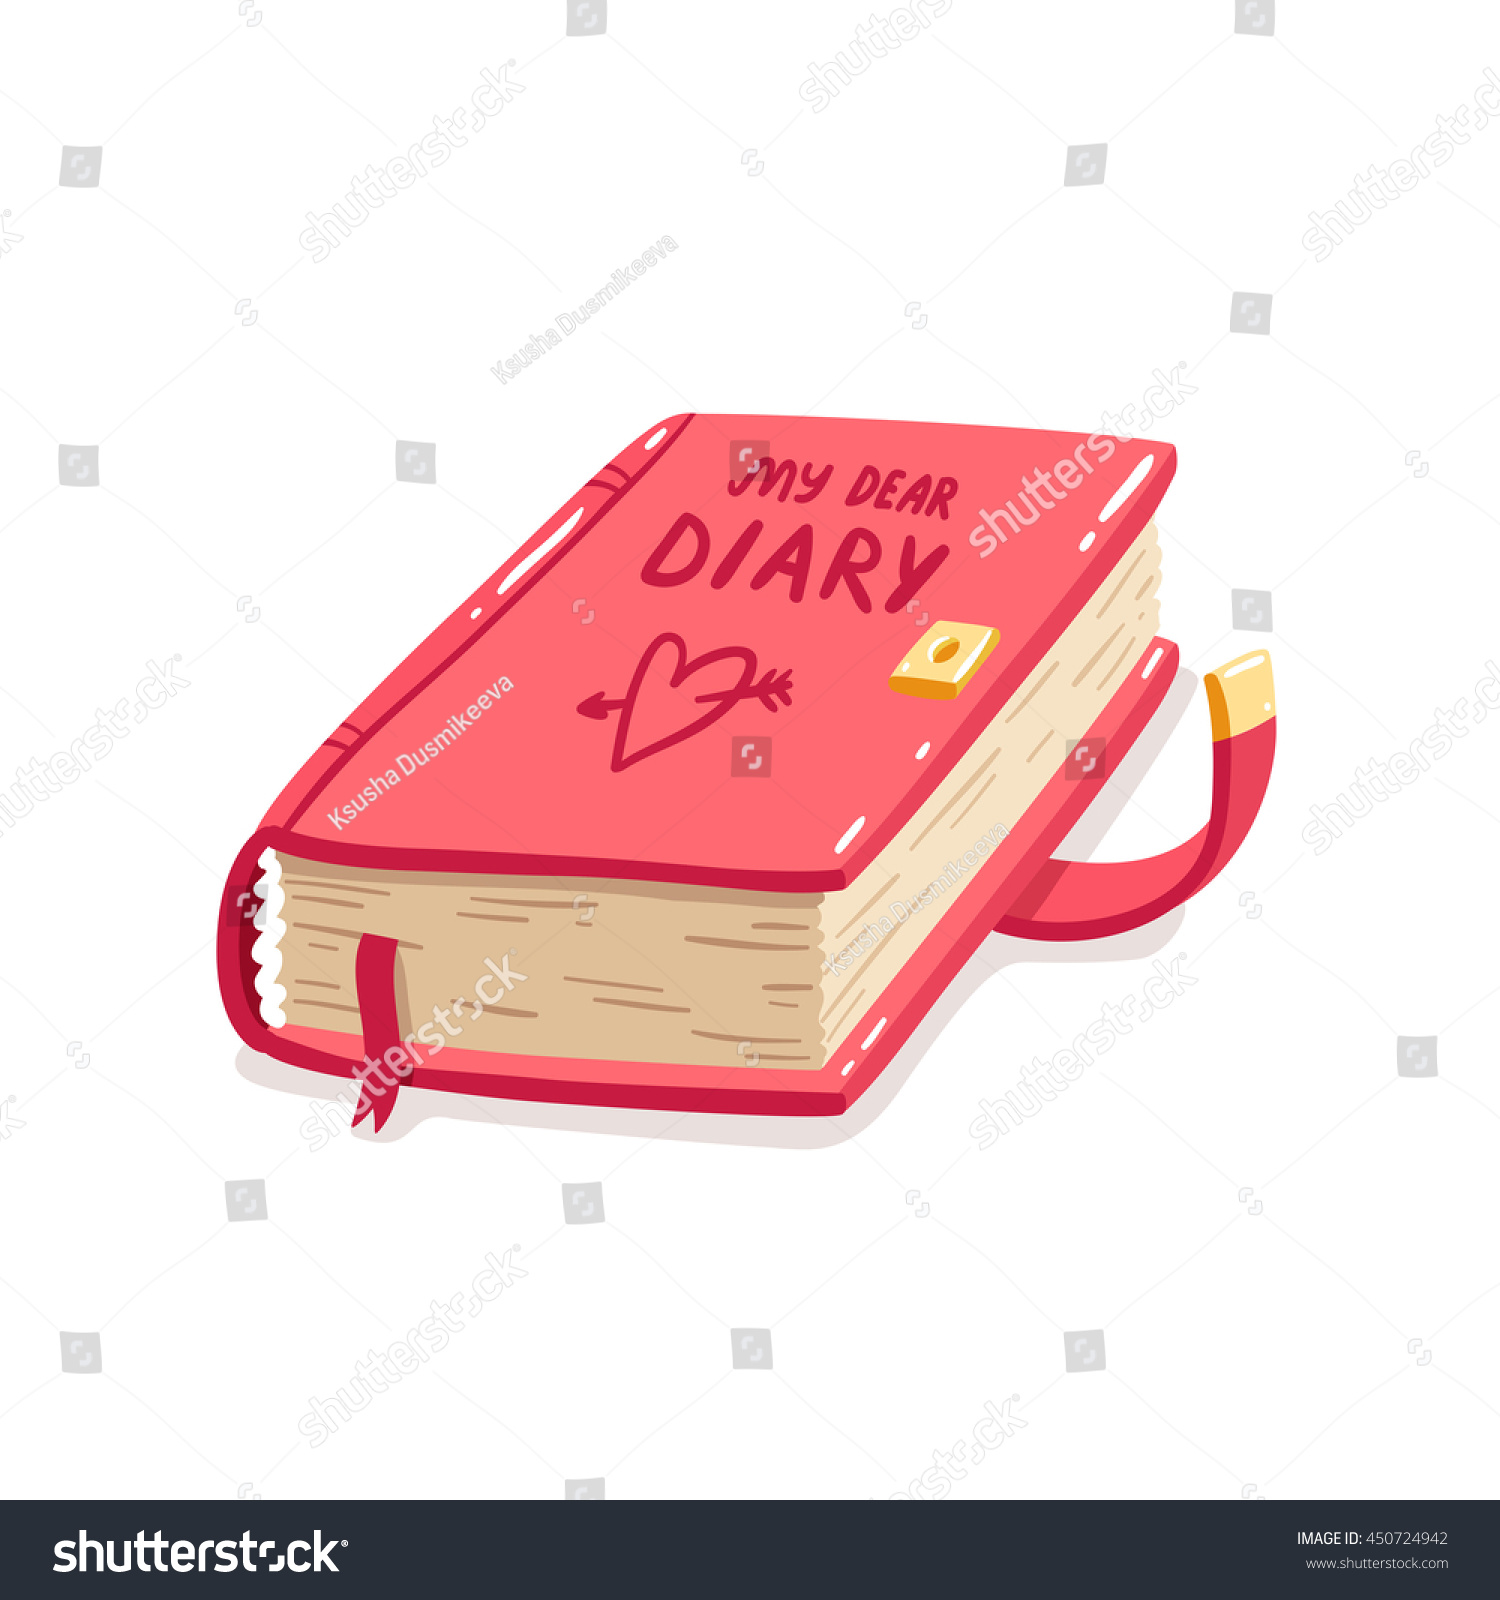 Cartoon Diary: My Dear Diary Cartoon Vector Illustration Stock Vector